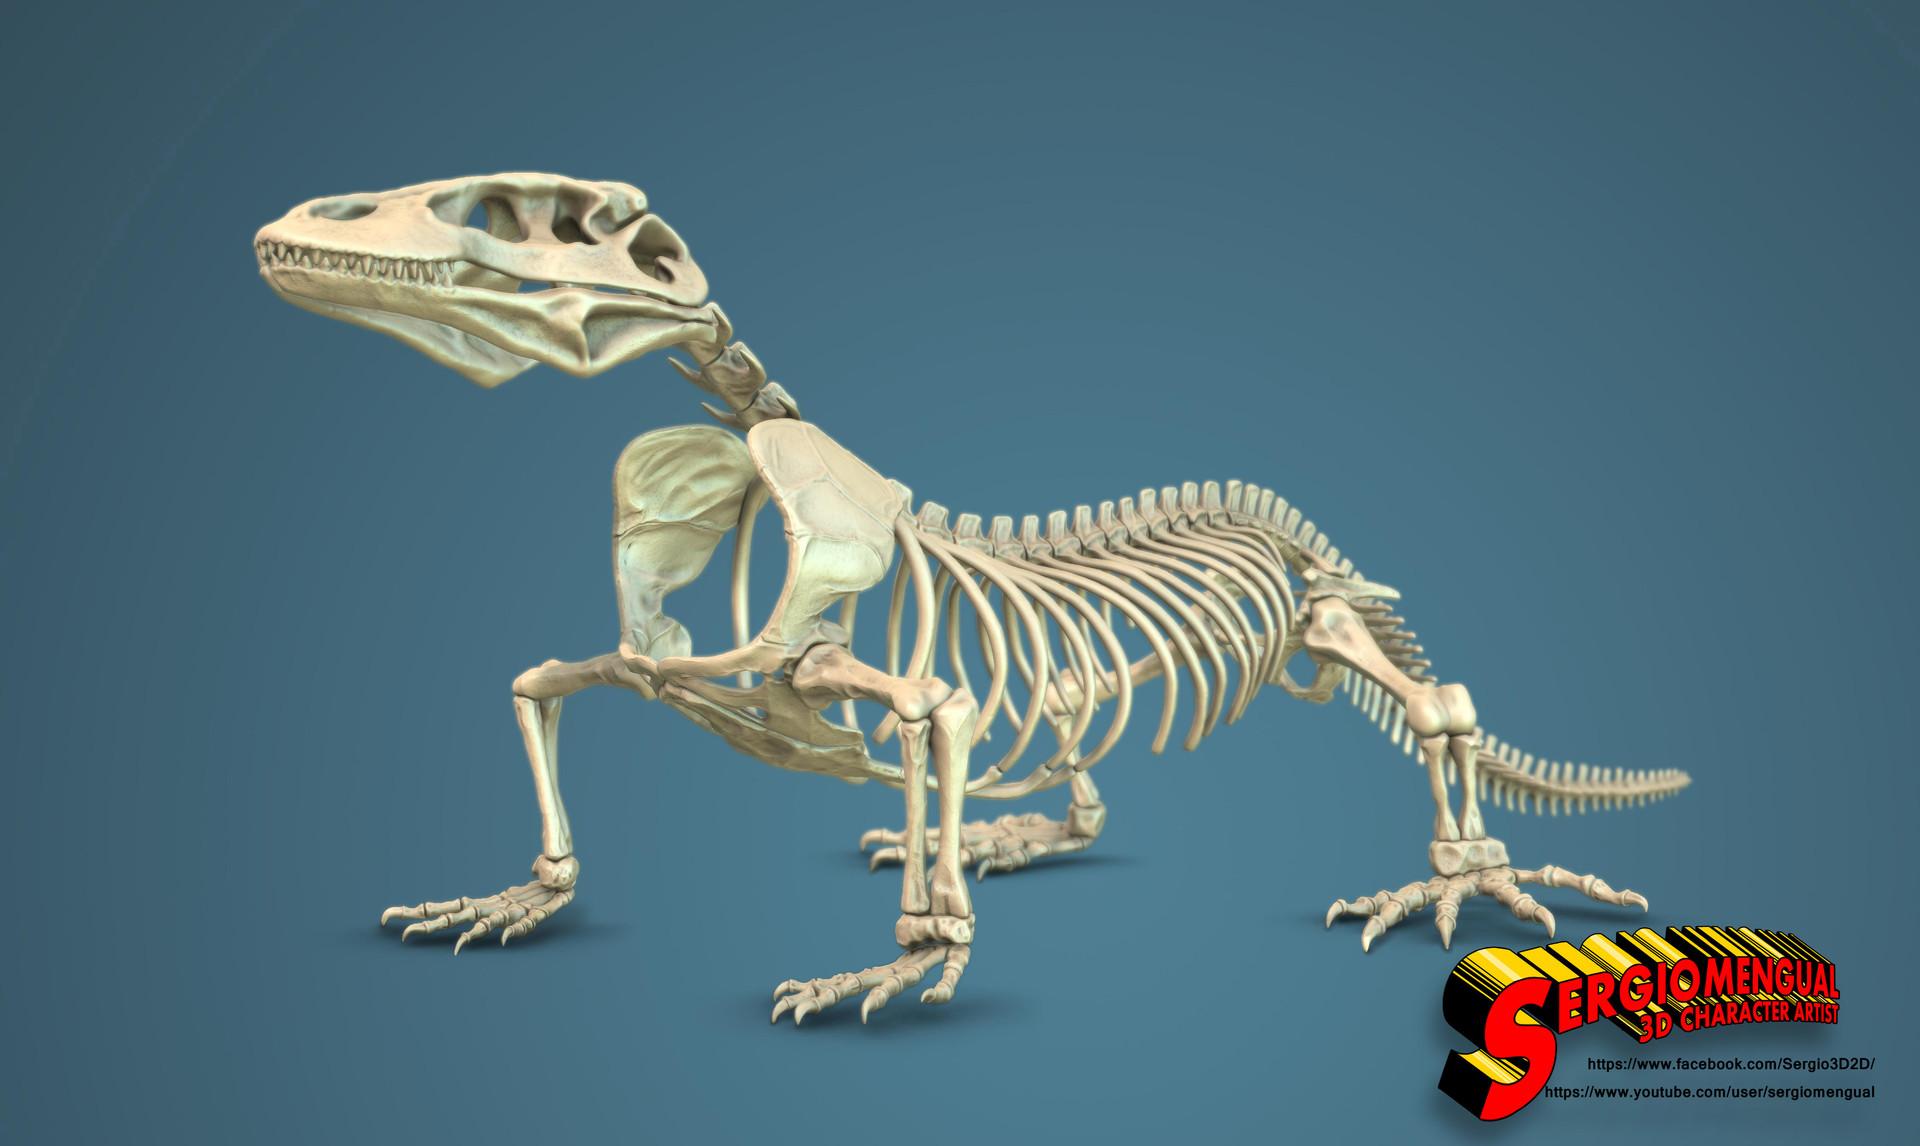 Autodesk Home Designer Sergio Gabriel Mengual Komodo Dragon Skeleton By Sergio